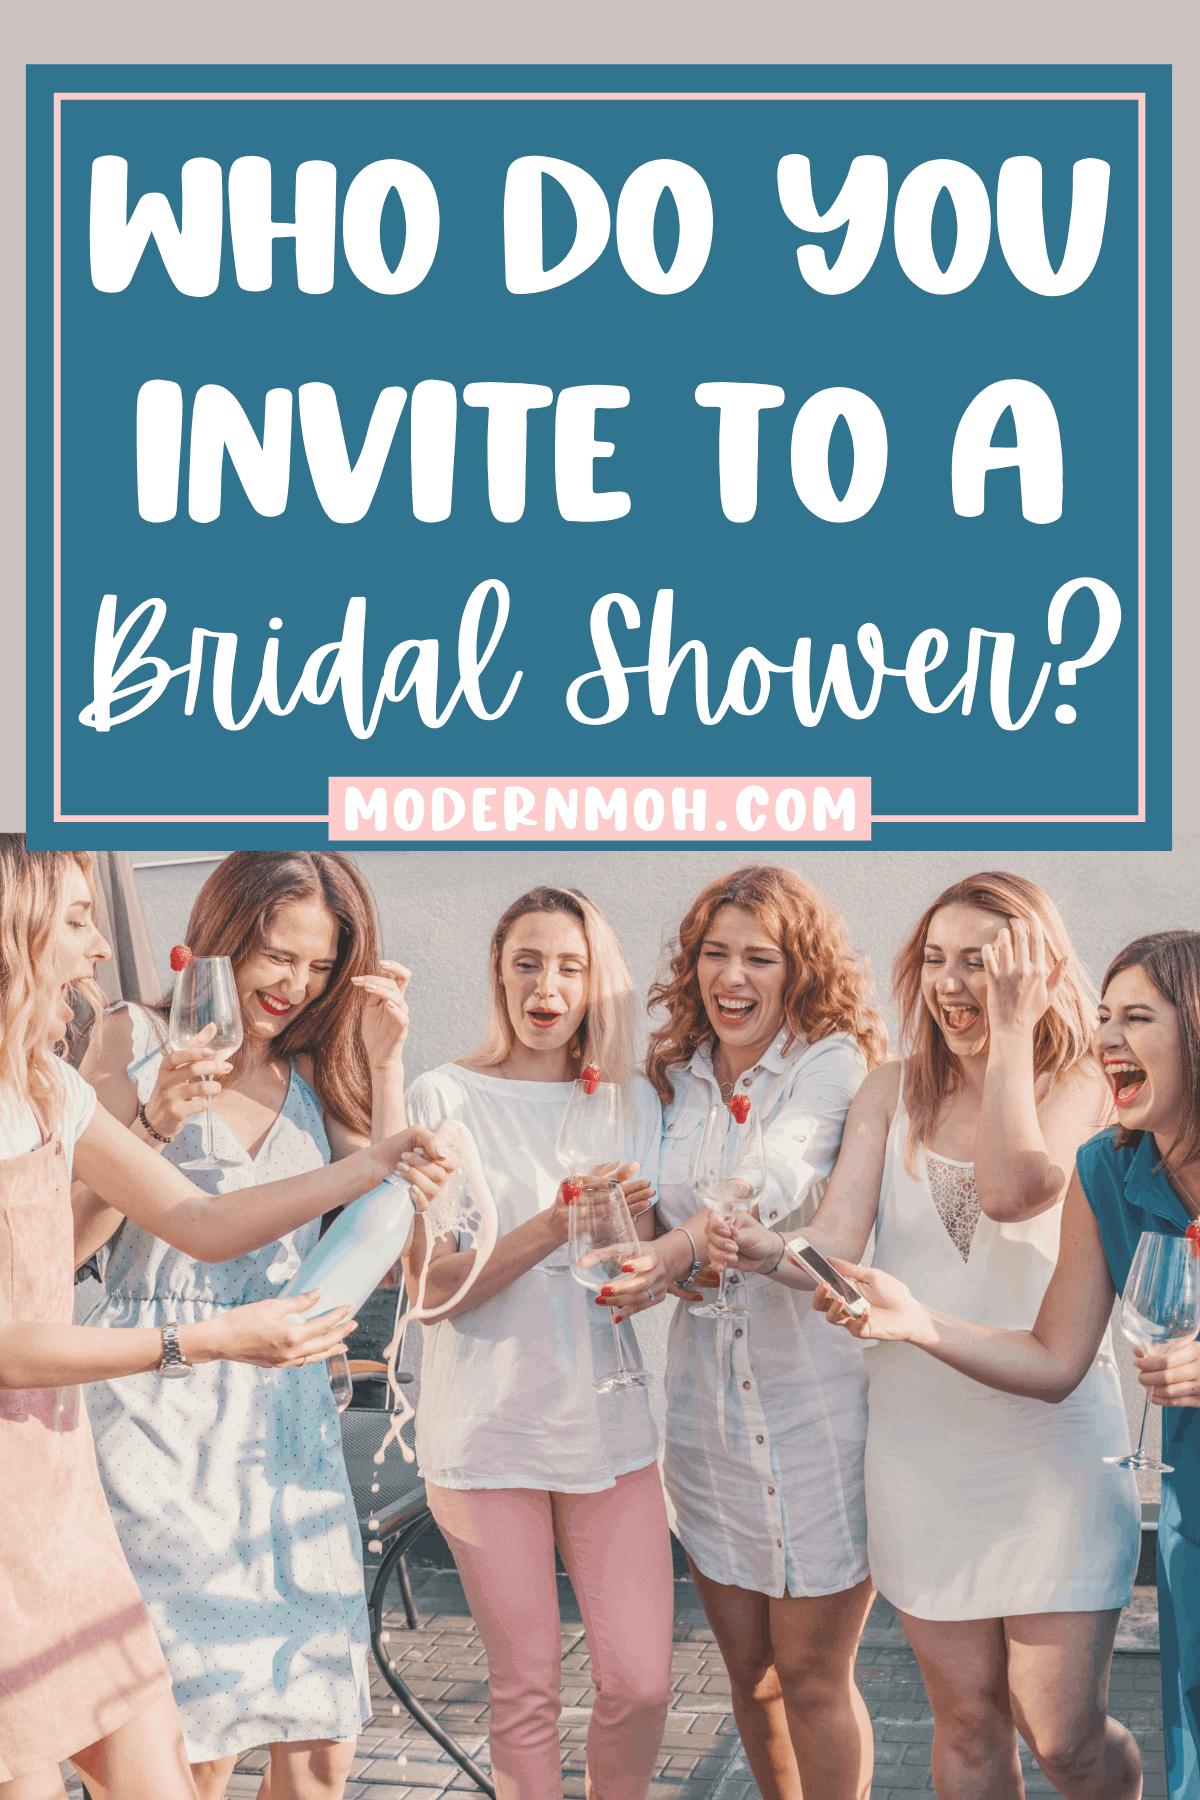 Who Do You Invite to a Bridal Shower?